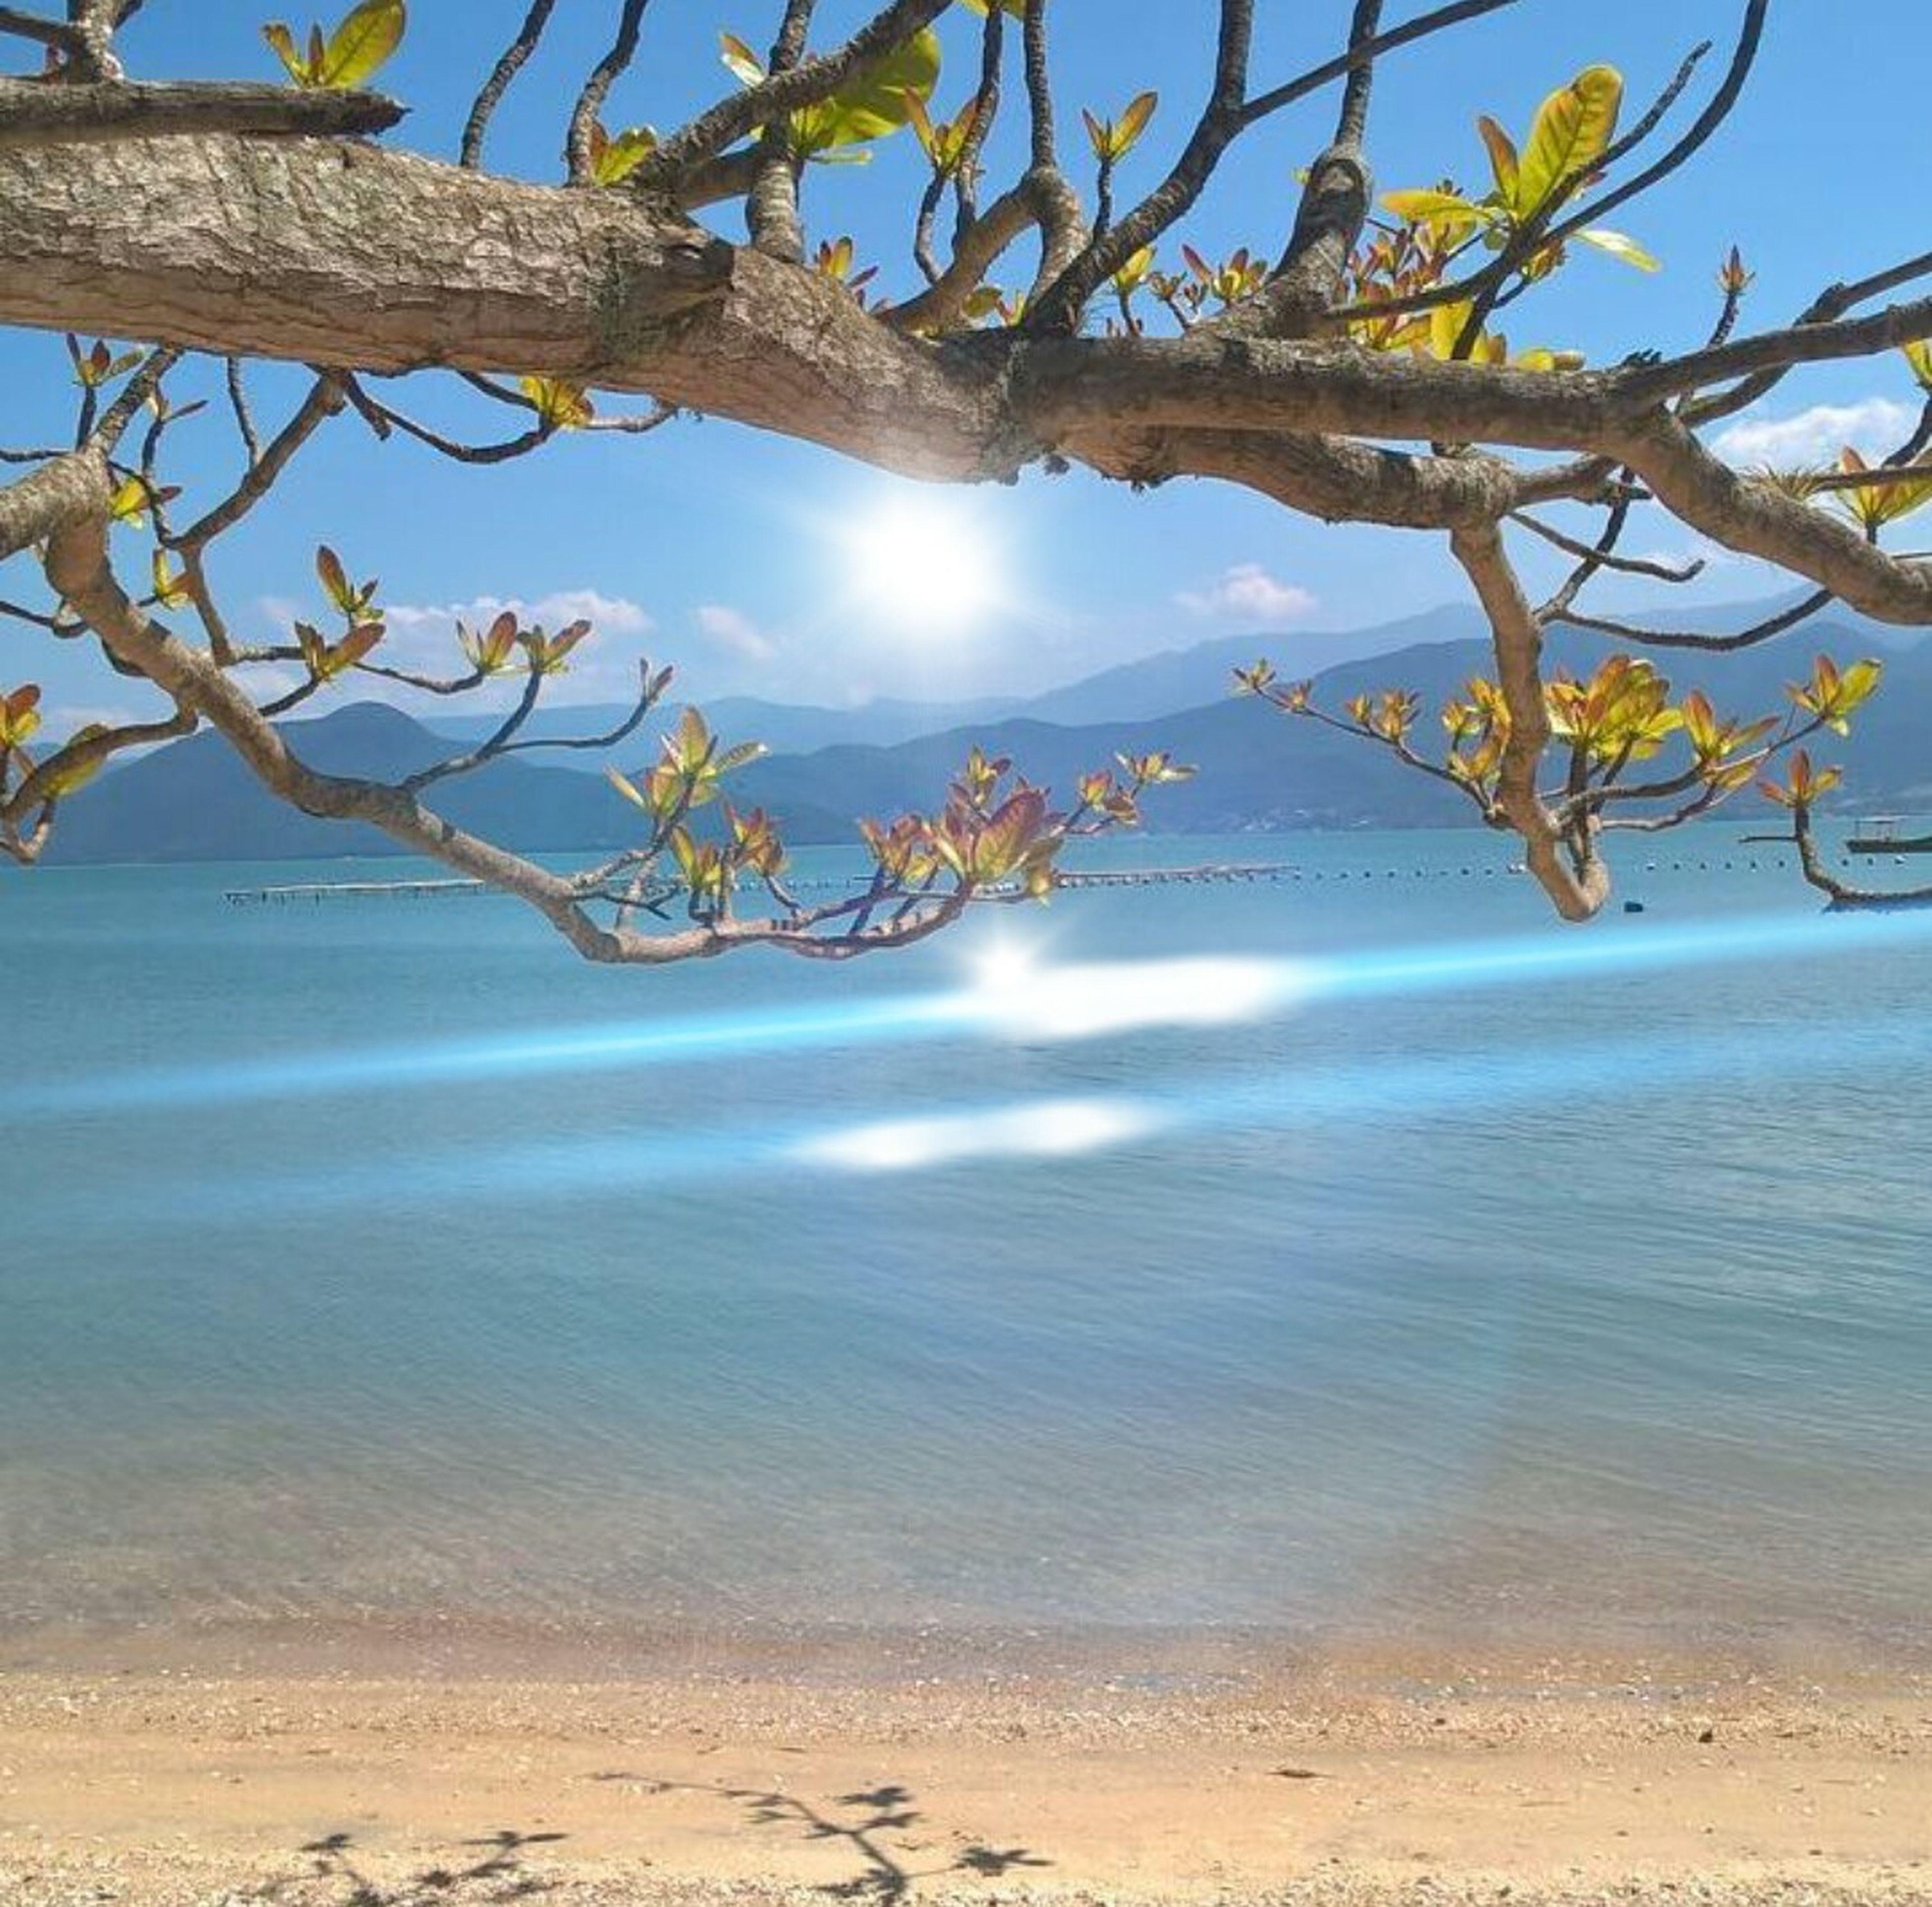 sea, water, branch, beach, scenics, horizon over water, tranquil scene, shore, sand, tranquility, beauty in nature, sky, nature, blue, calm, cloud, seascape, coastline, non-urban scene, outdoors, day, mountain, remote, no people, cloud - sky, solitude, majestic